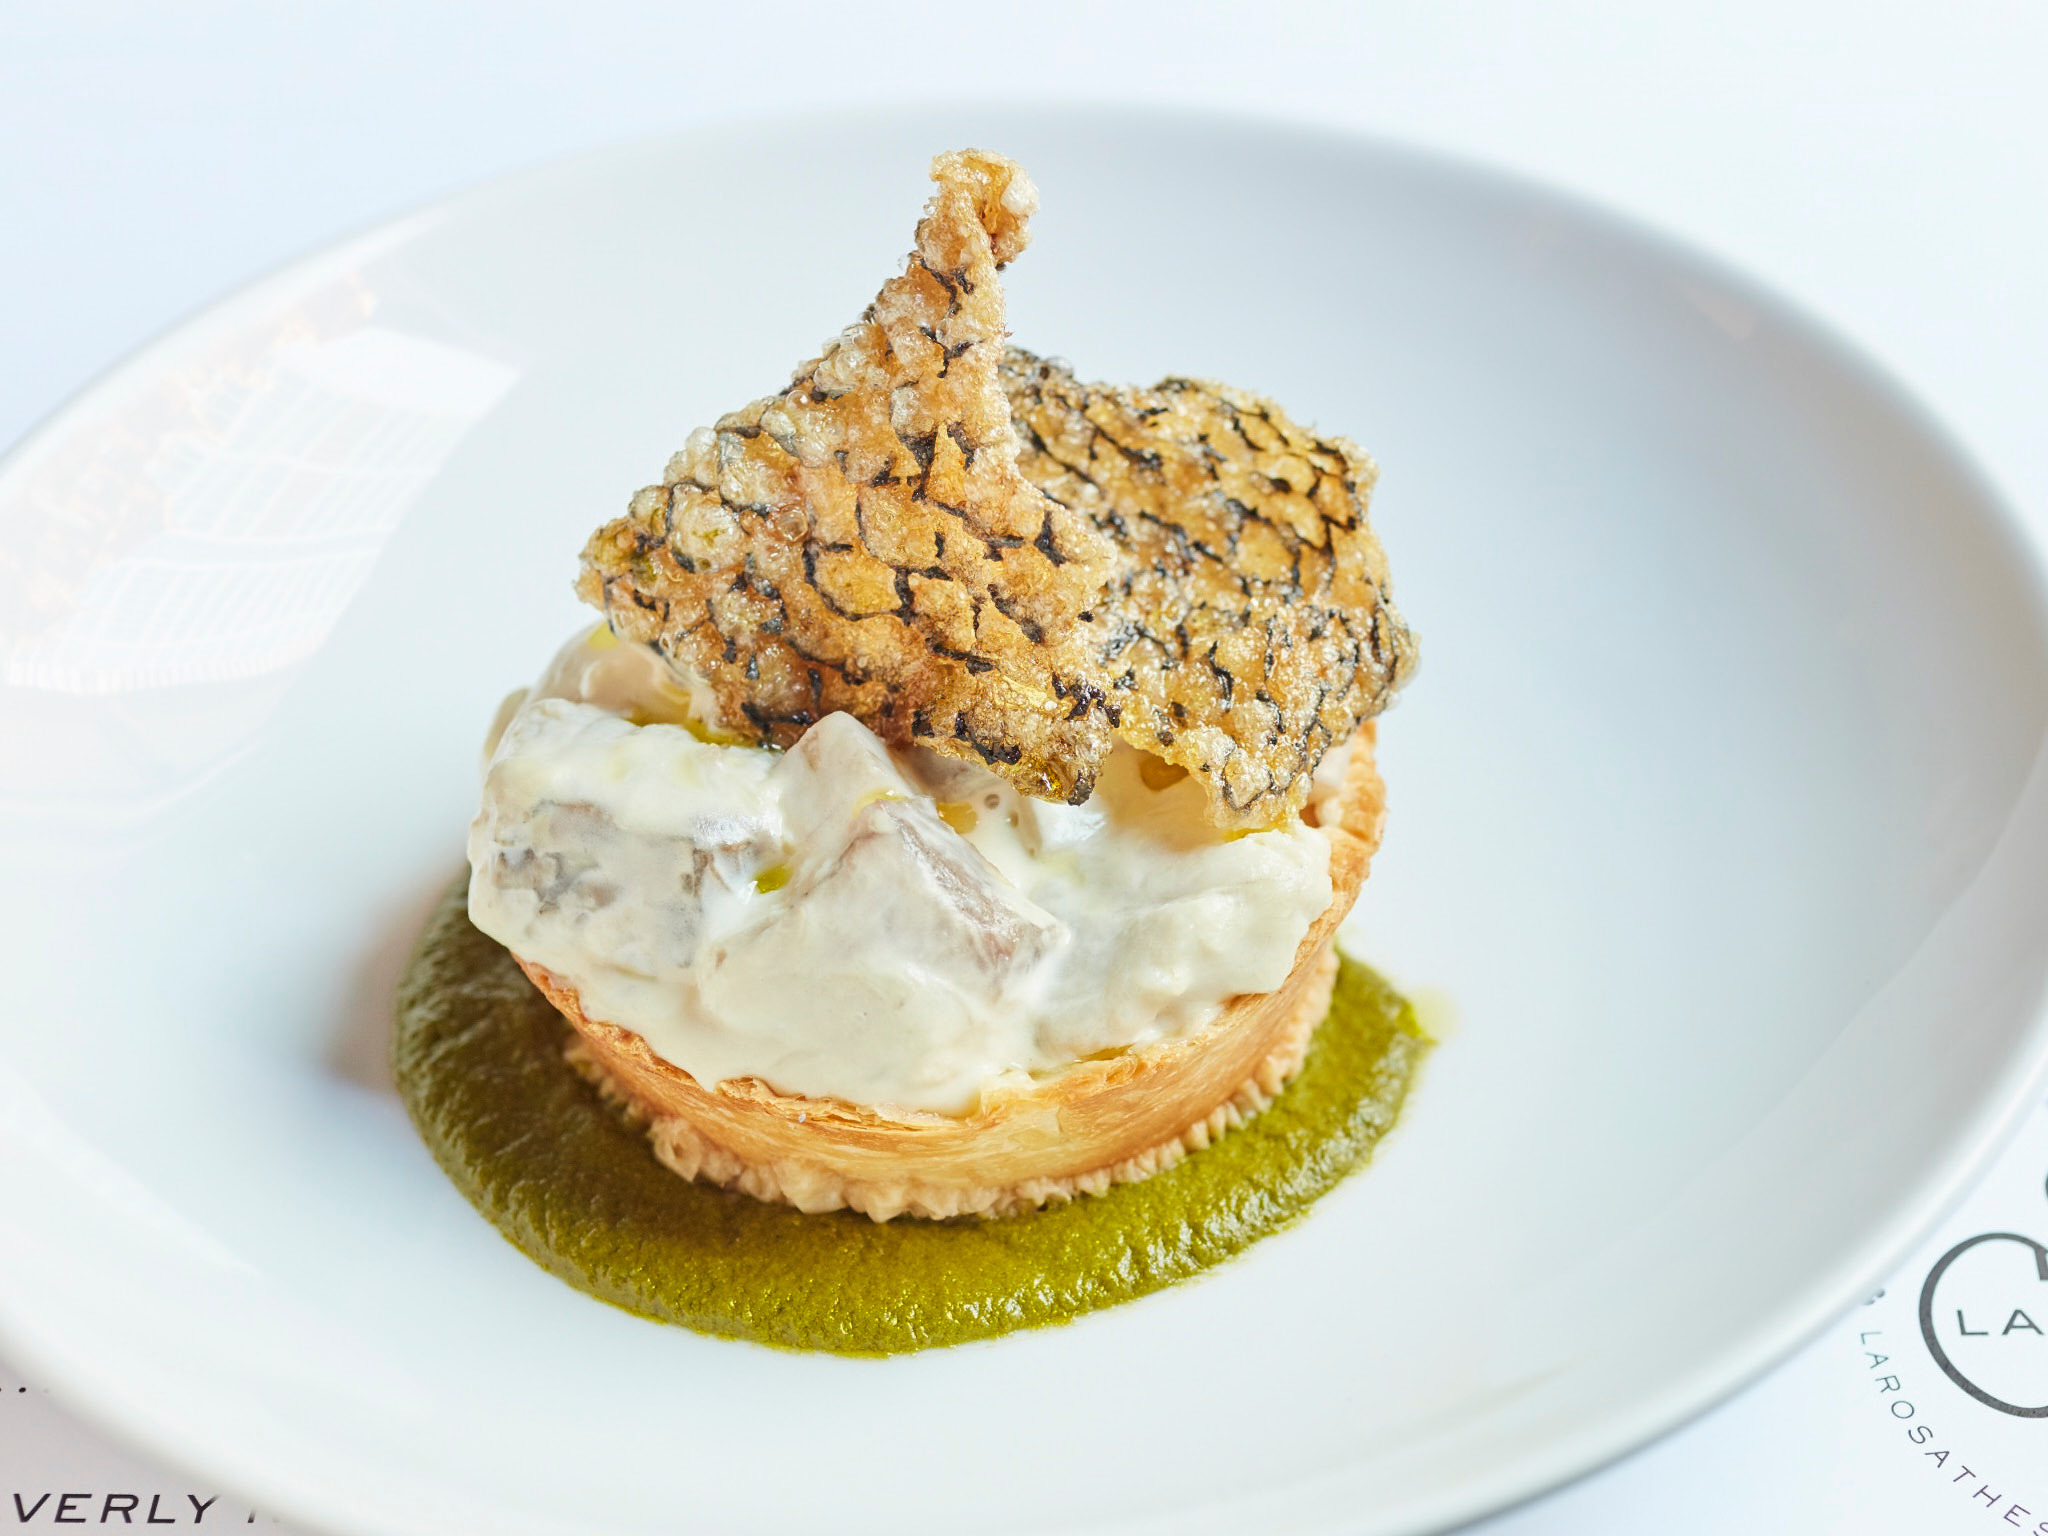 La Rosa's fish pie.